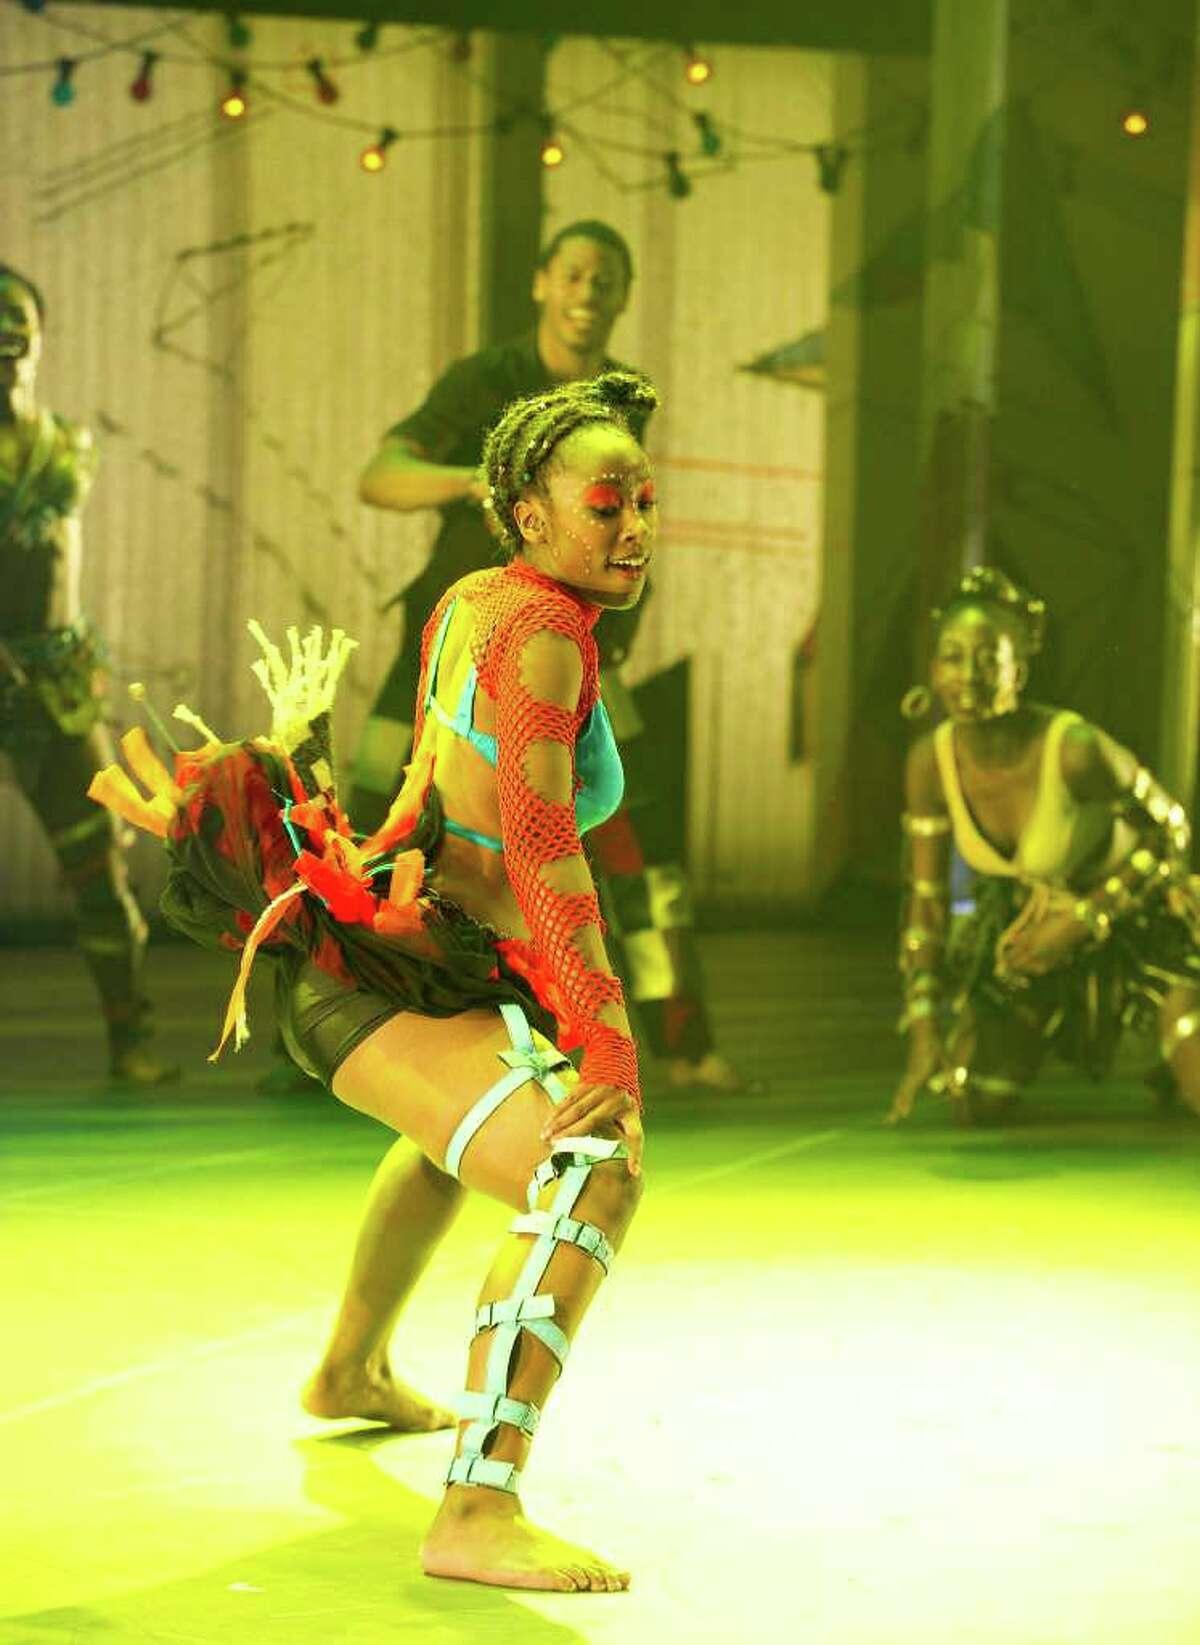 A scene from Fela at Olivier, National Theatre. Directed by Bill T. Jones. (Tristram Kenton)